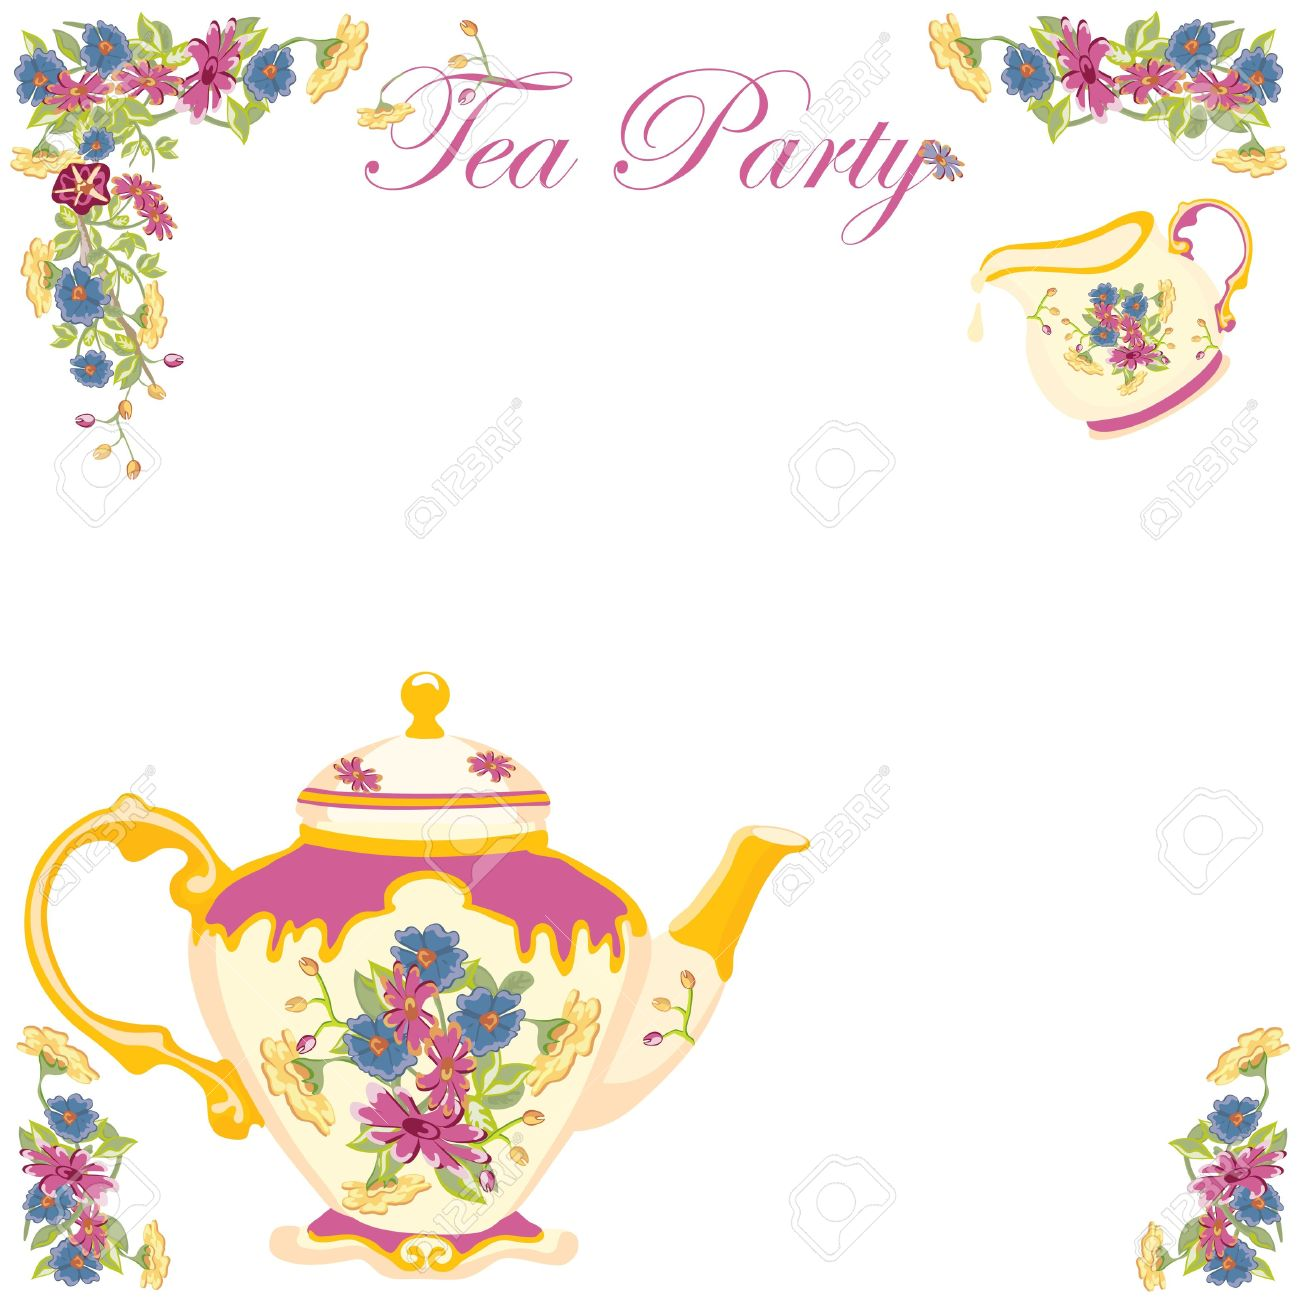 Tea Party Border Clipart.